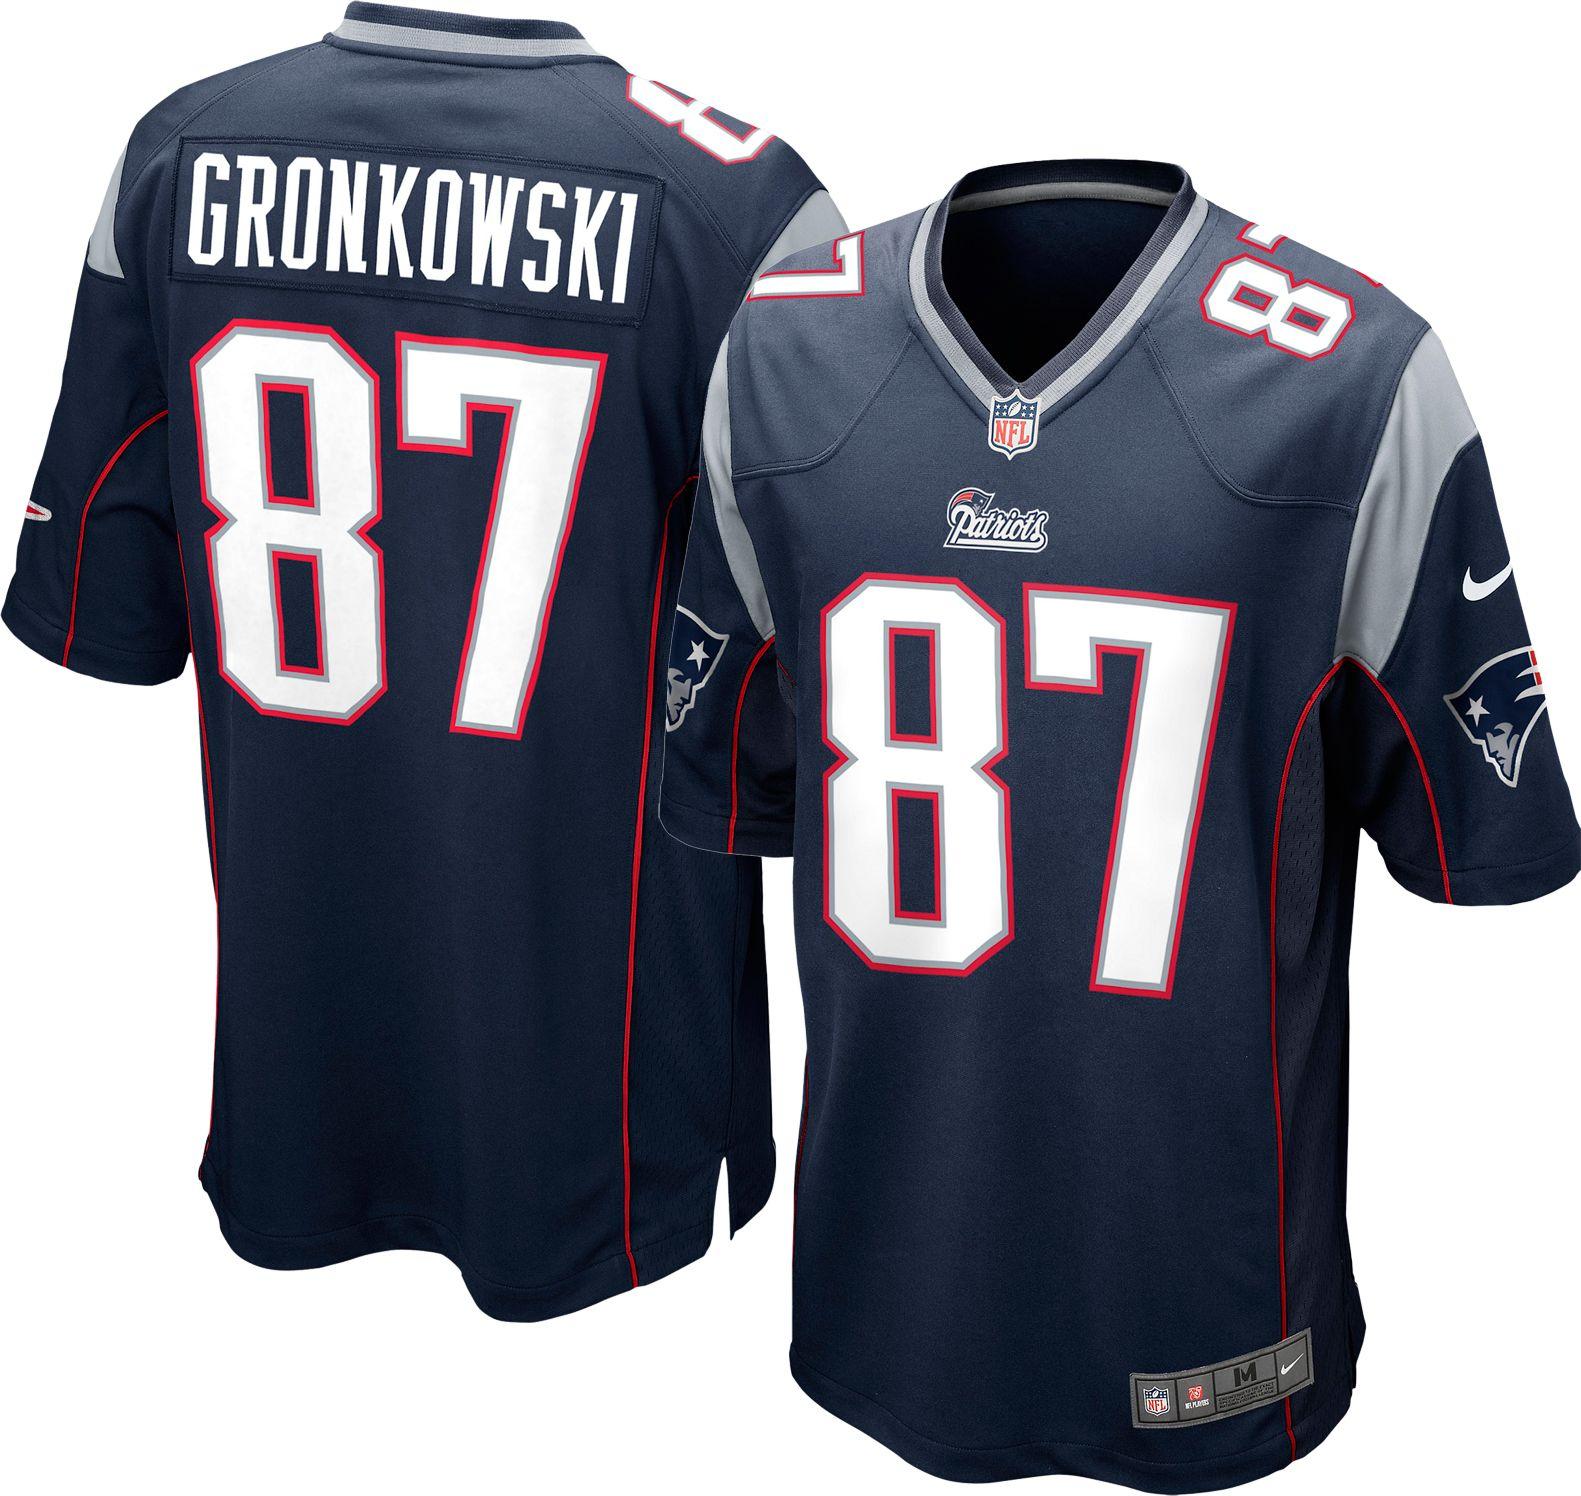 patriots 87 jersey